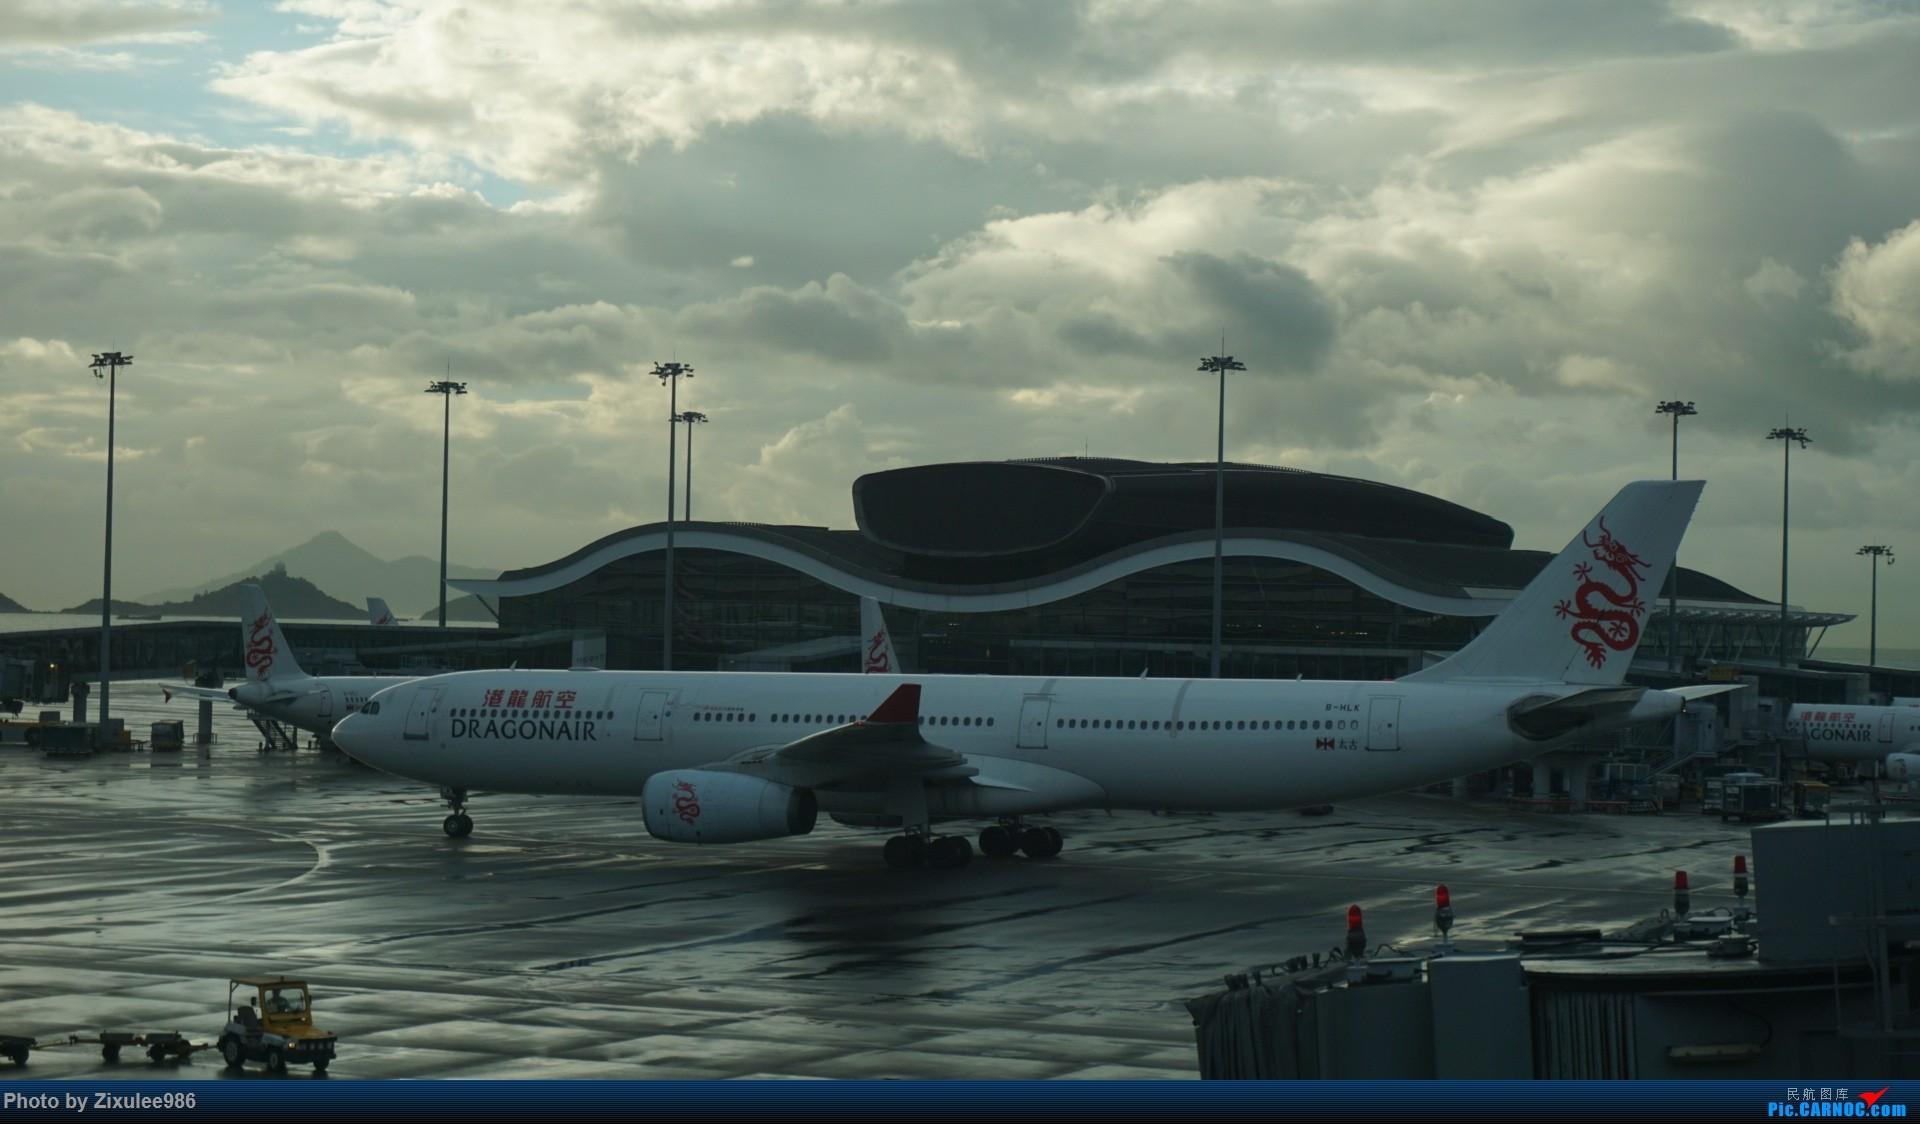 Re:[原创]十年 AIRBUS A330-300 B-HLK 中国香港国际机场